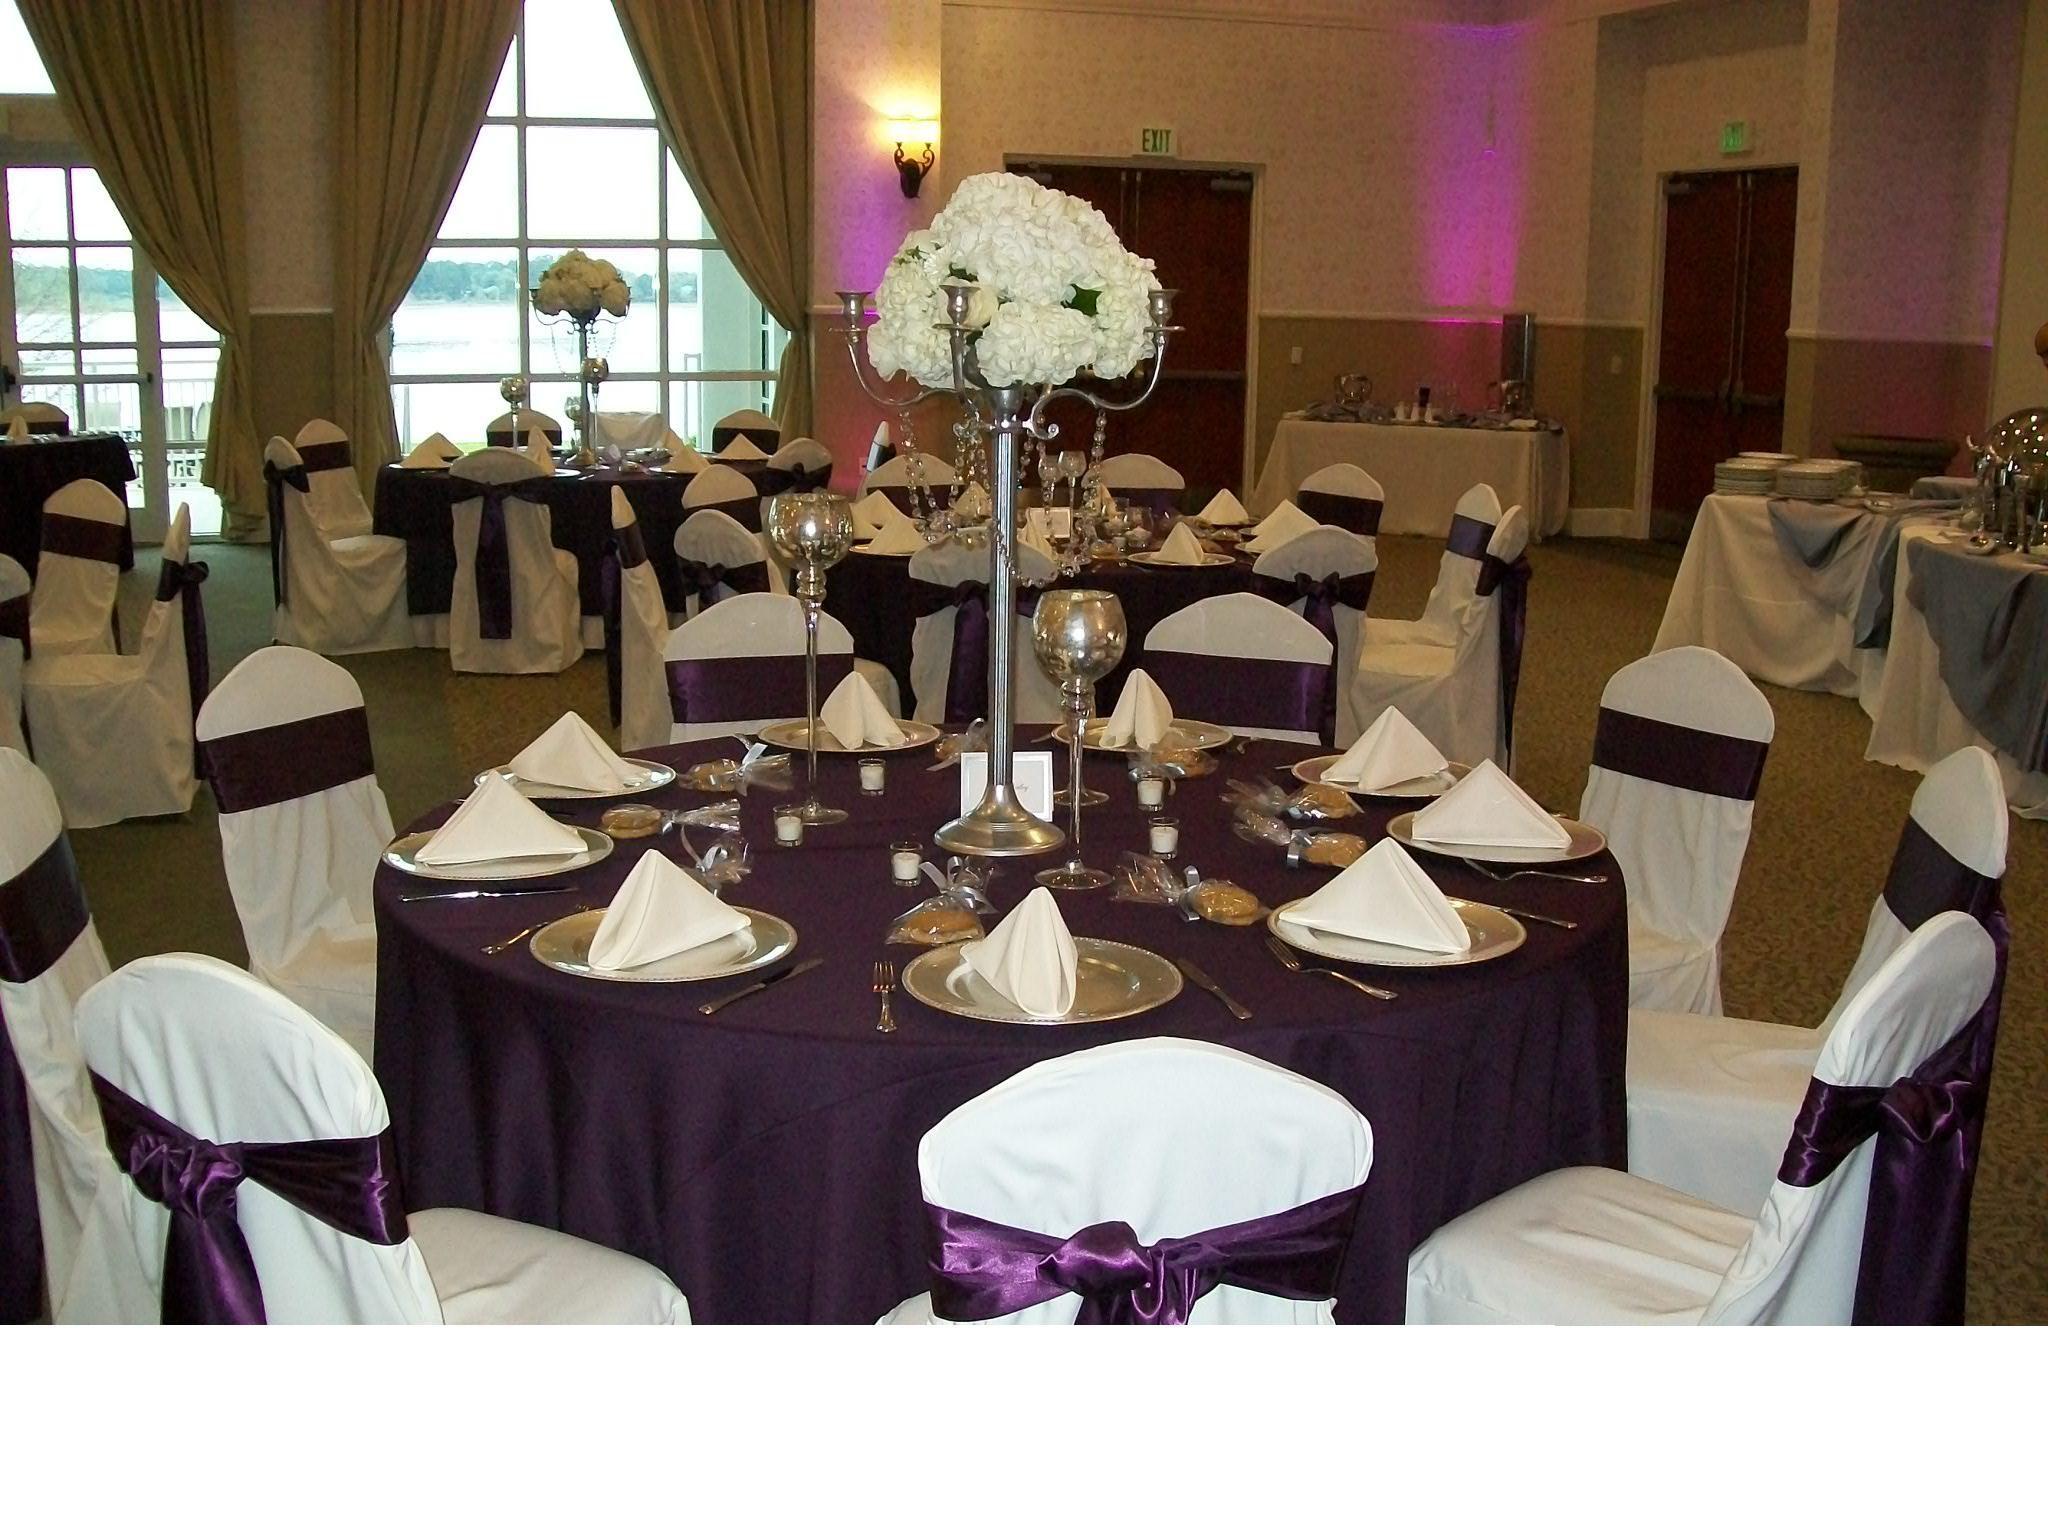 White Base Linen With A Full Eggplant Poly Overlay, White Poly Napkins,  White Ballroom Chair Covers With Eggplant (Plum) Satin Sash.